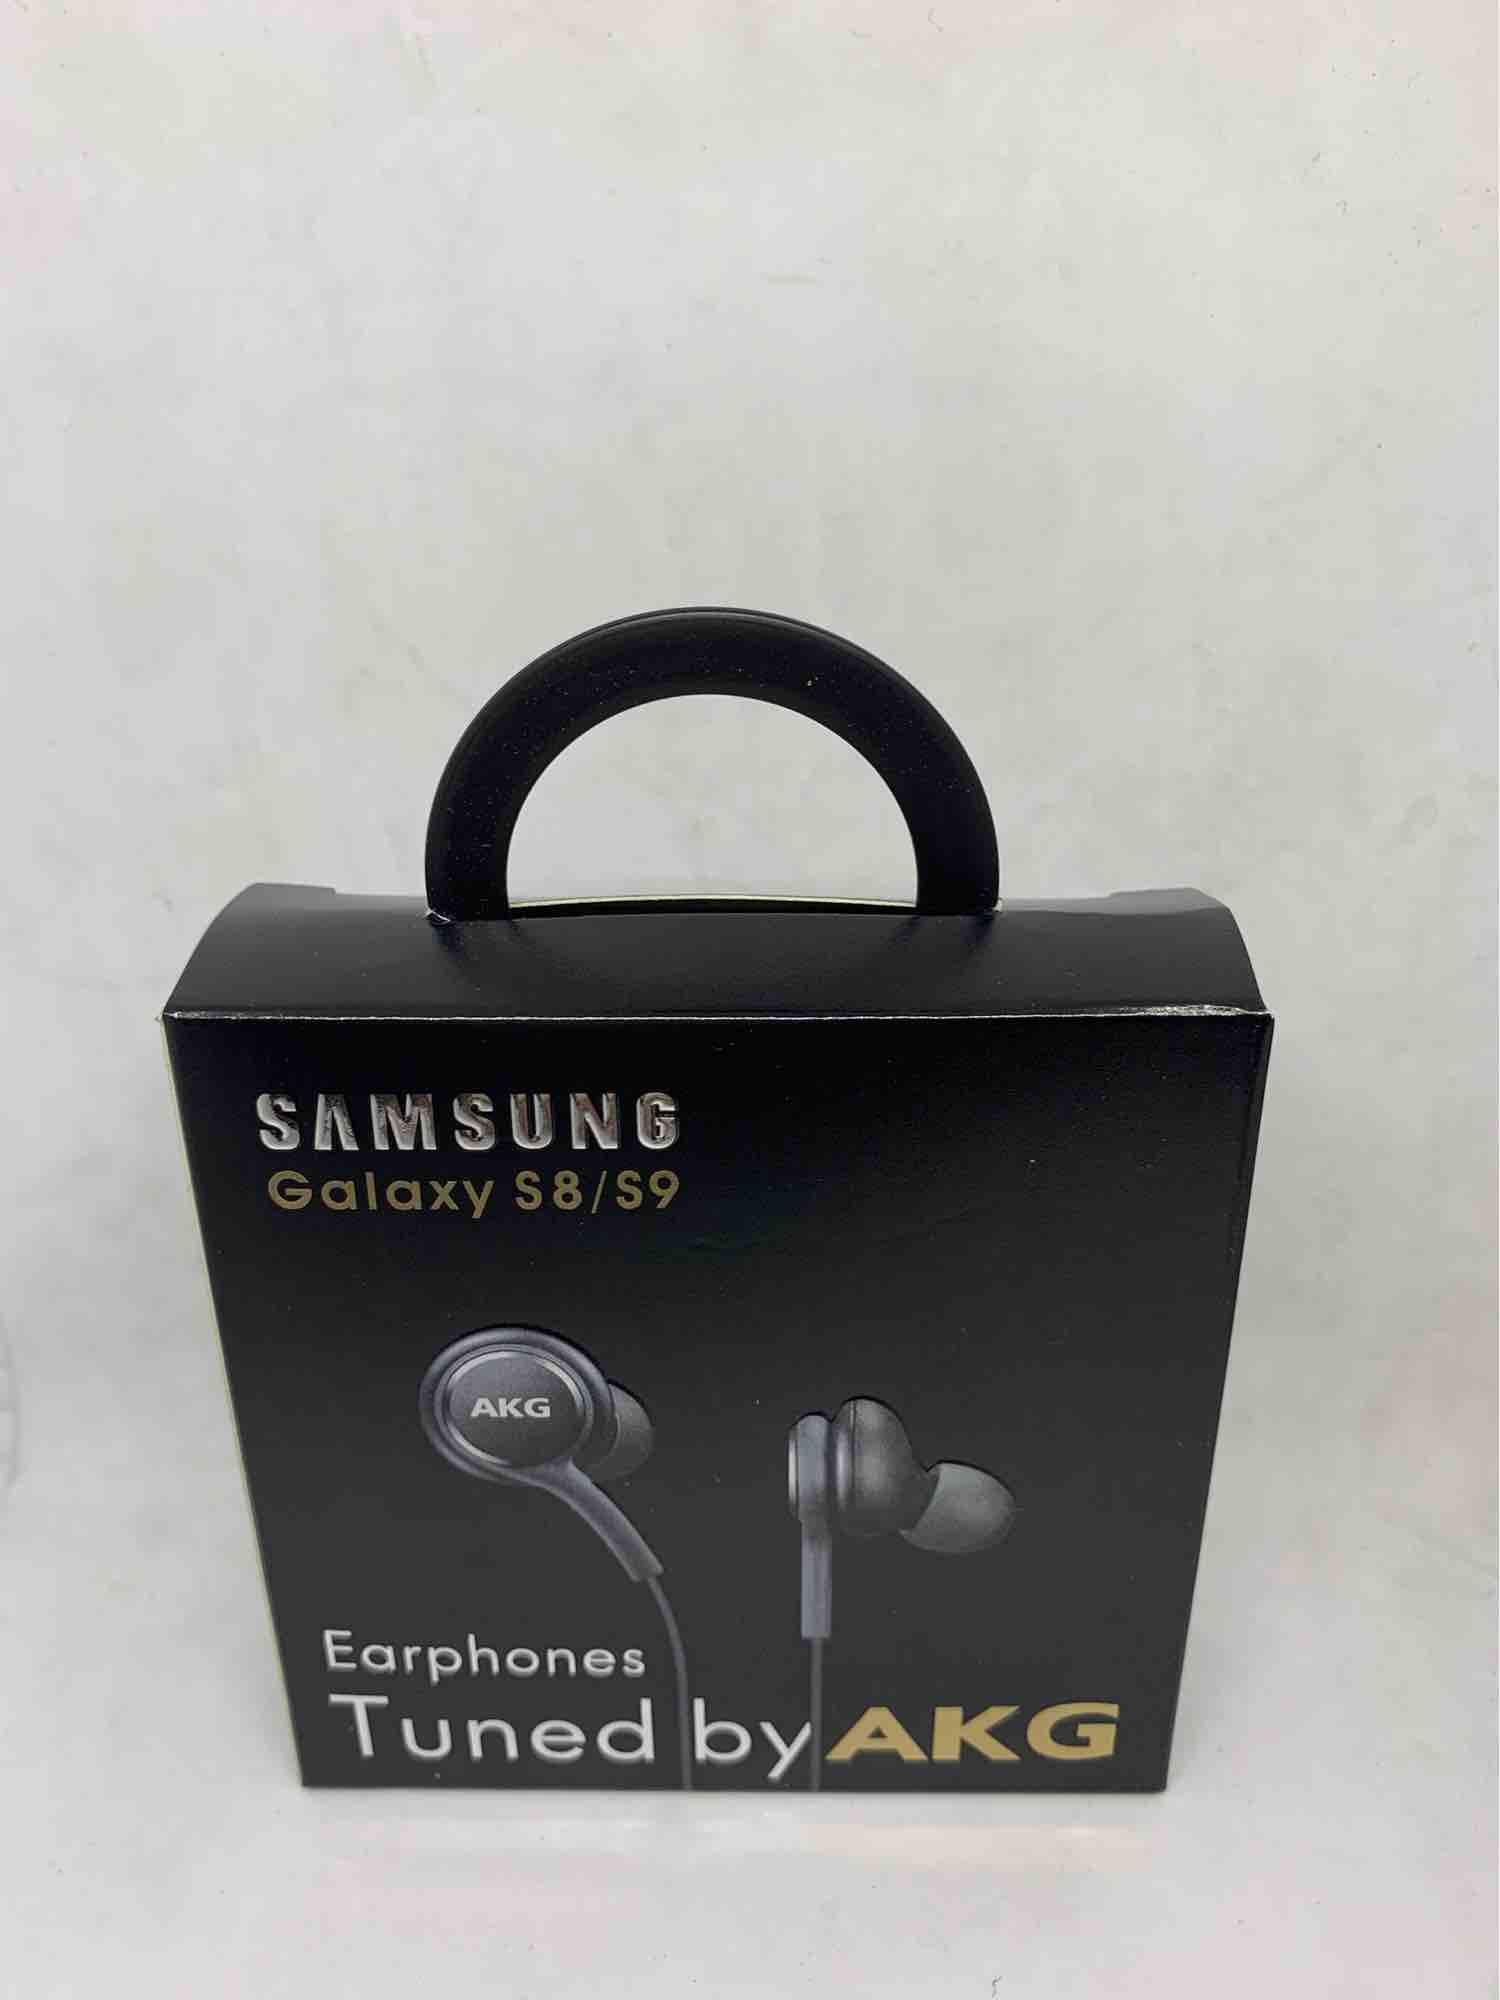 Akg Philippines: Akg price list - Earphones, Headphones, for sale